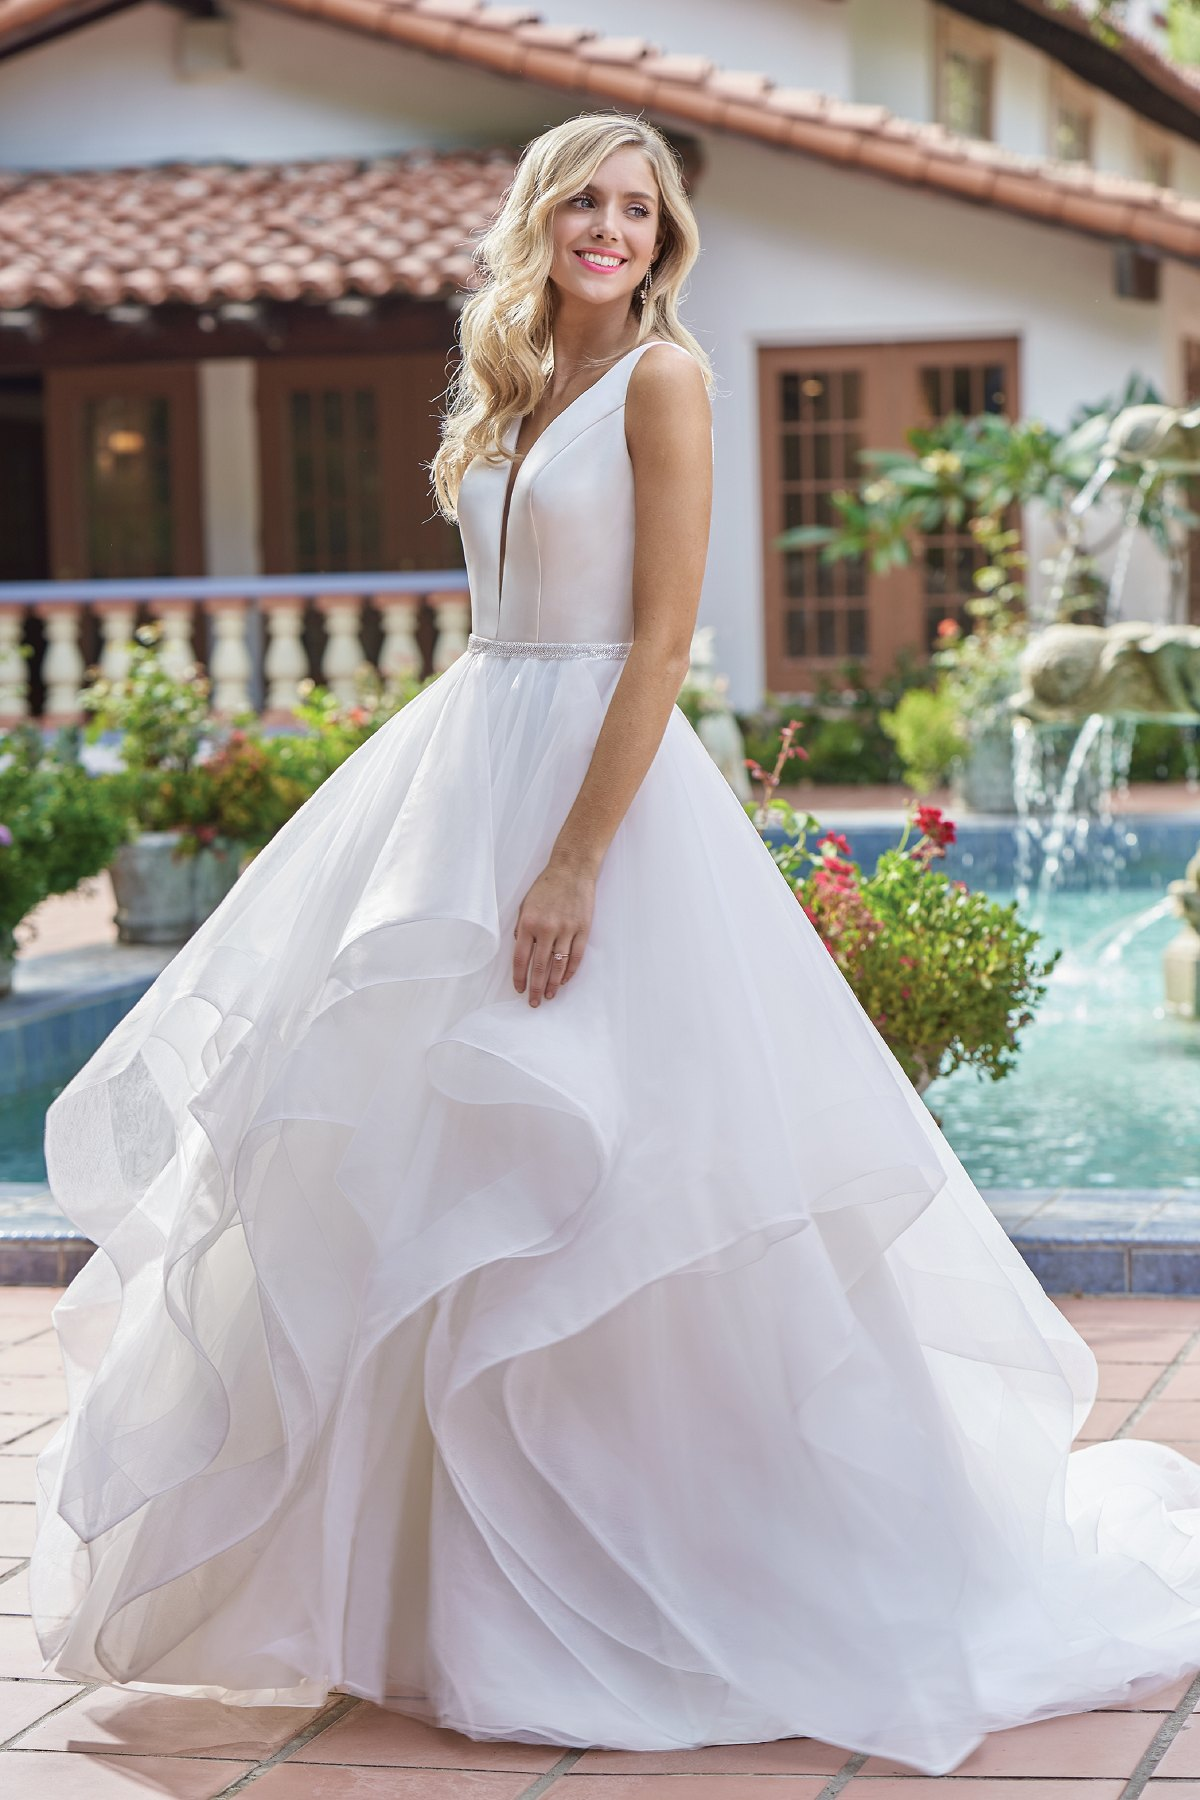 F211015 Gorgeous Italian Satin Organza Ball Gown Wedding Dress